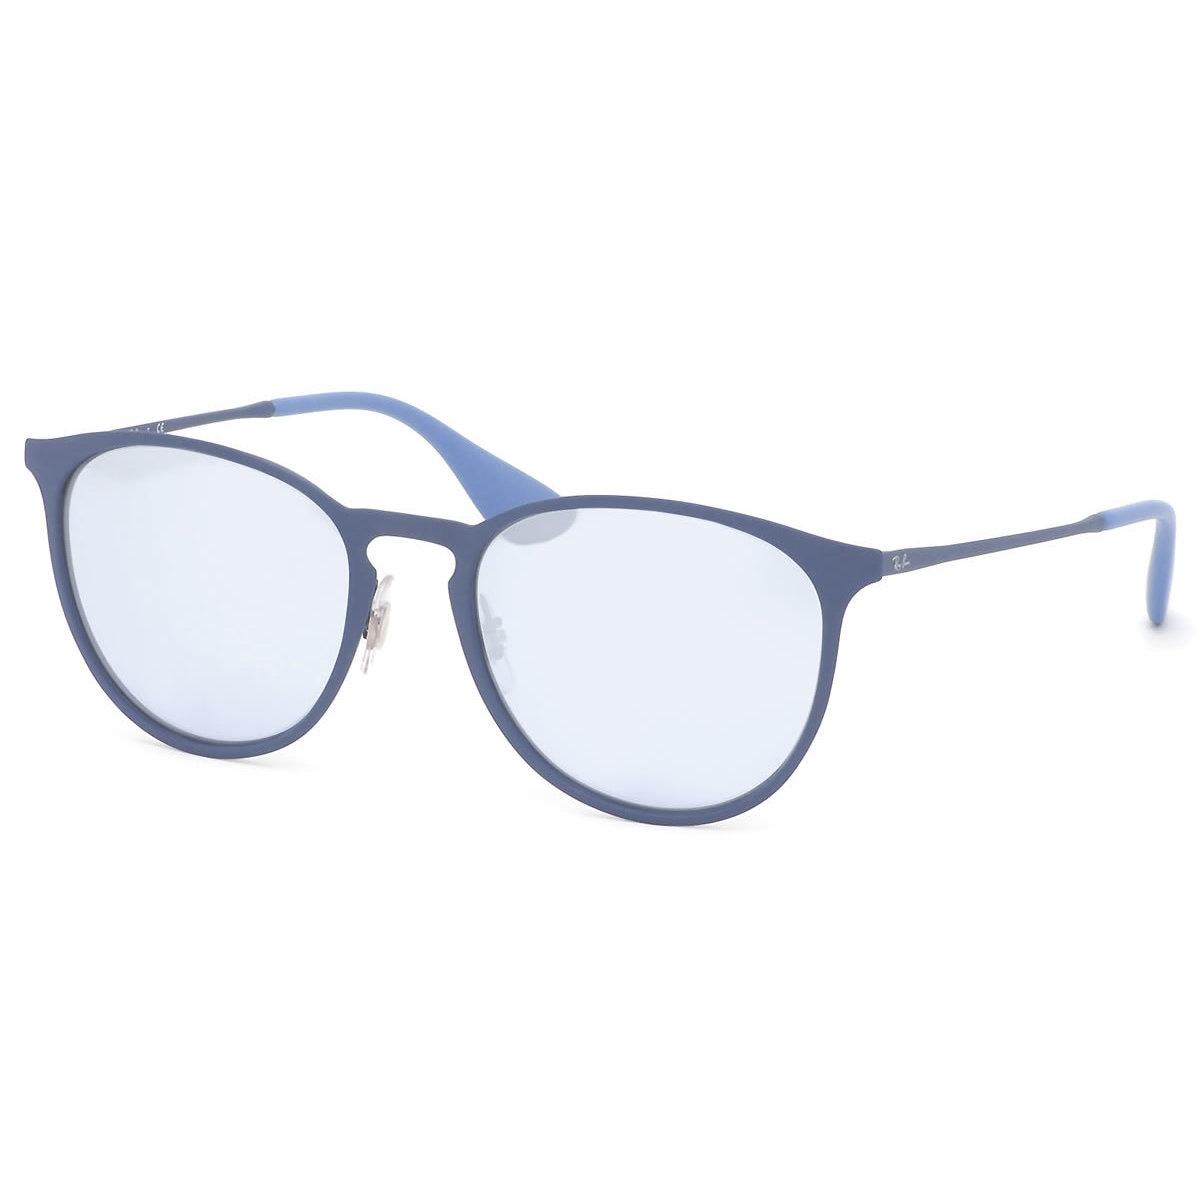 300a35bd53 Ray-Ban Men s RB3539 90221U Erika Blue Frame Grey Mirror 54mm Lens  Sunglasses